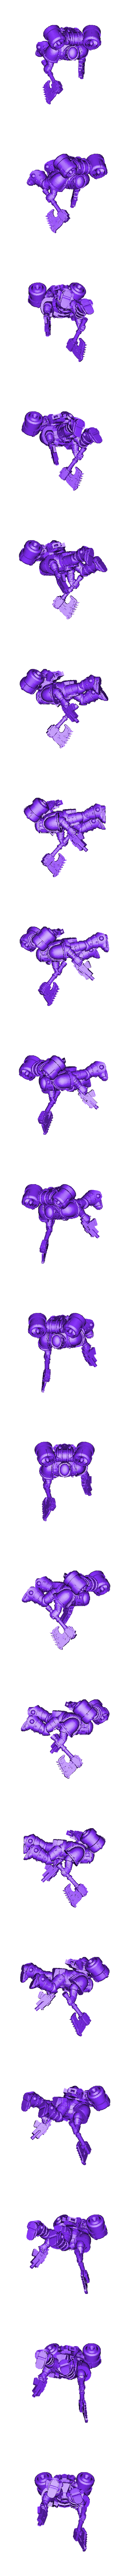 MK2_chainaxe_assault_6.stl Download free STL file Marine assault squad Eaters of Worlds • 3D printer template, KarnageKing